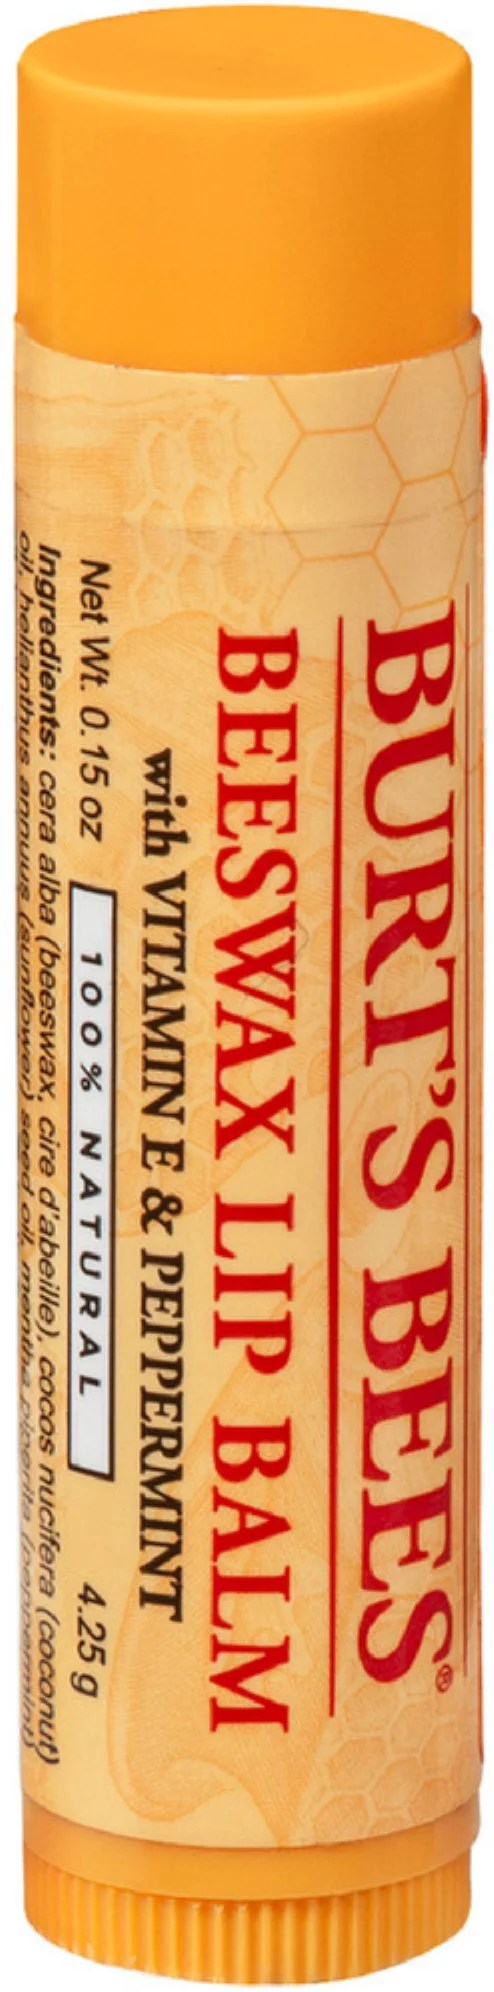 3 Pack - Burt's Bees Beeswax Lip Balm with Vitamin E ...